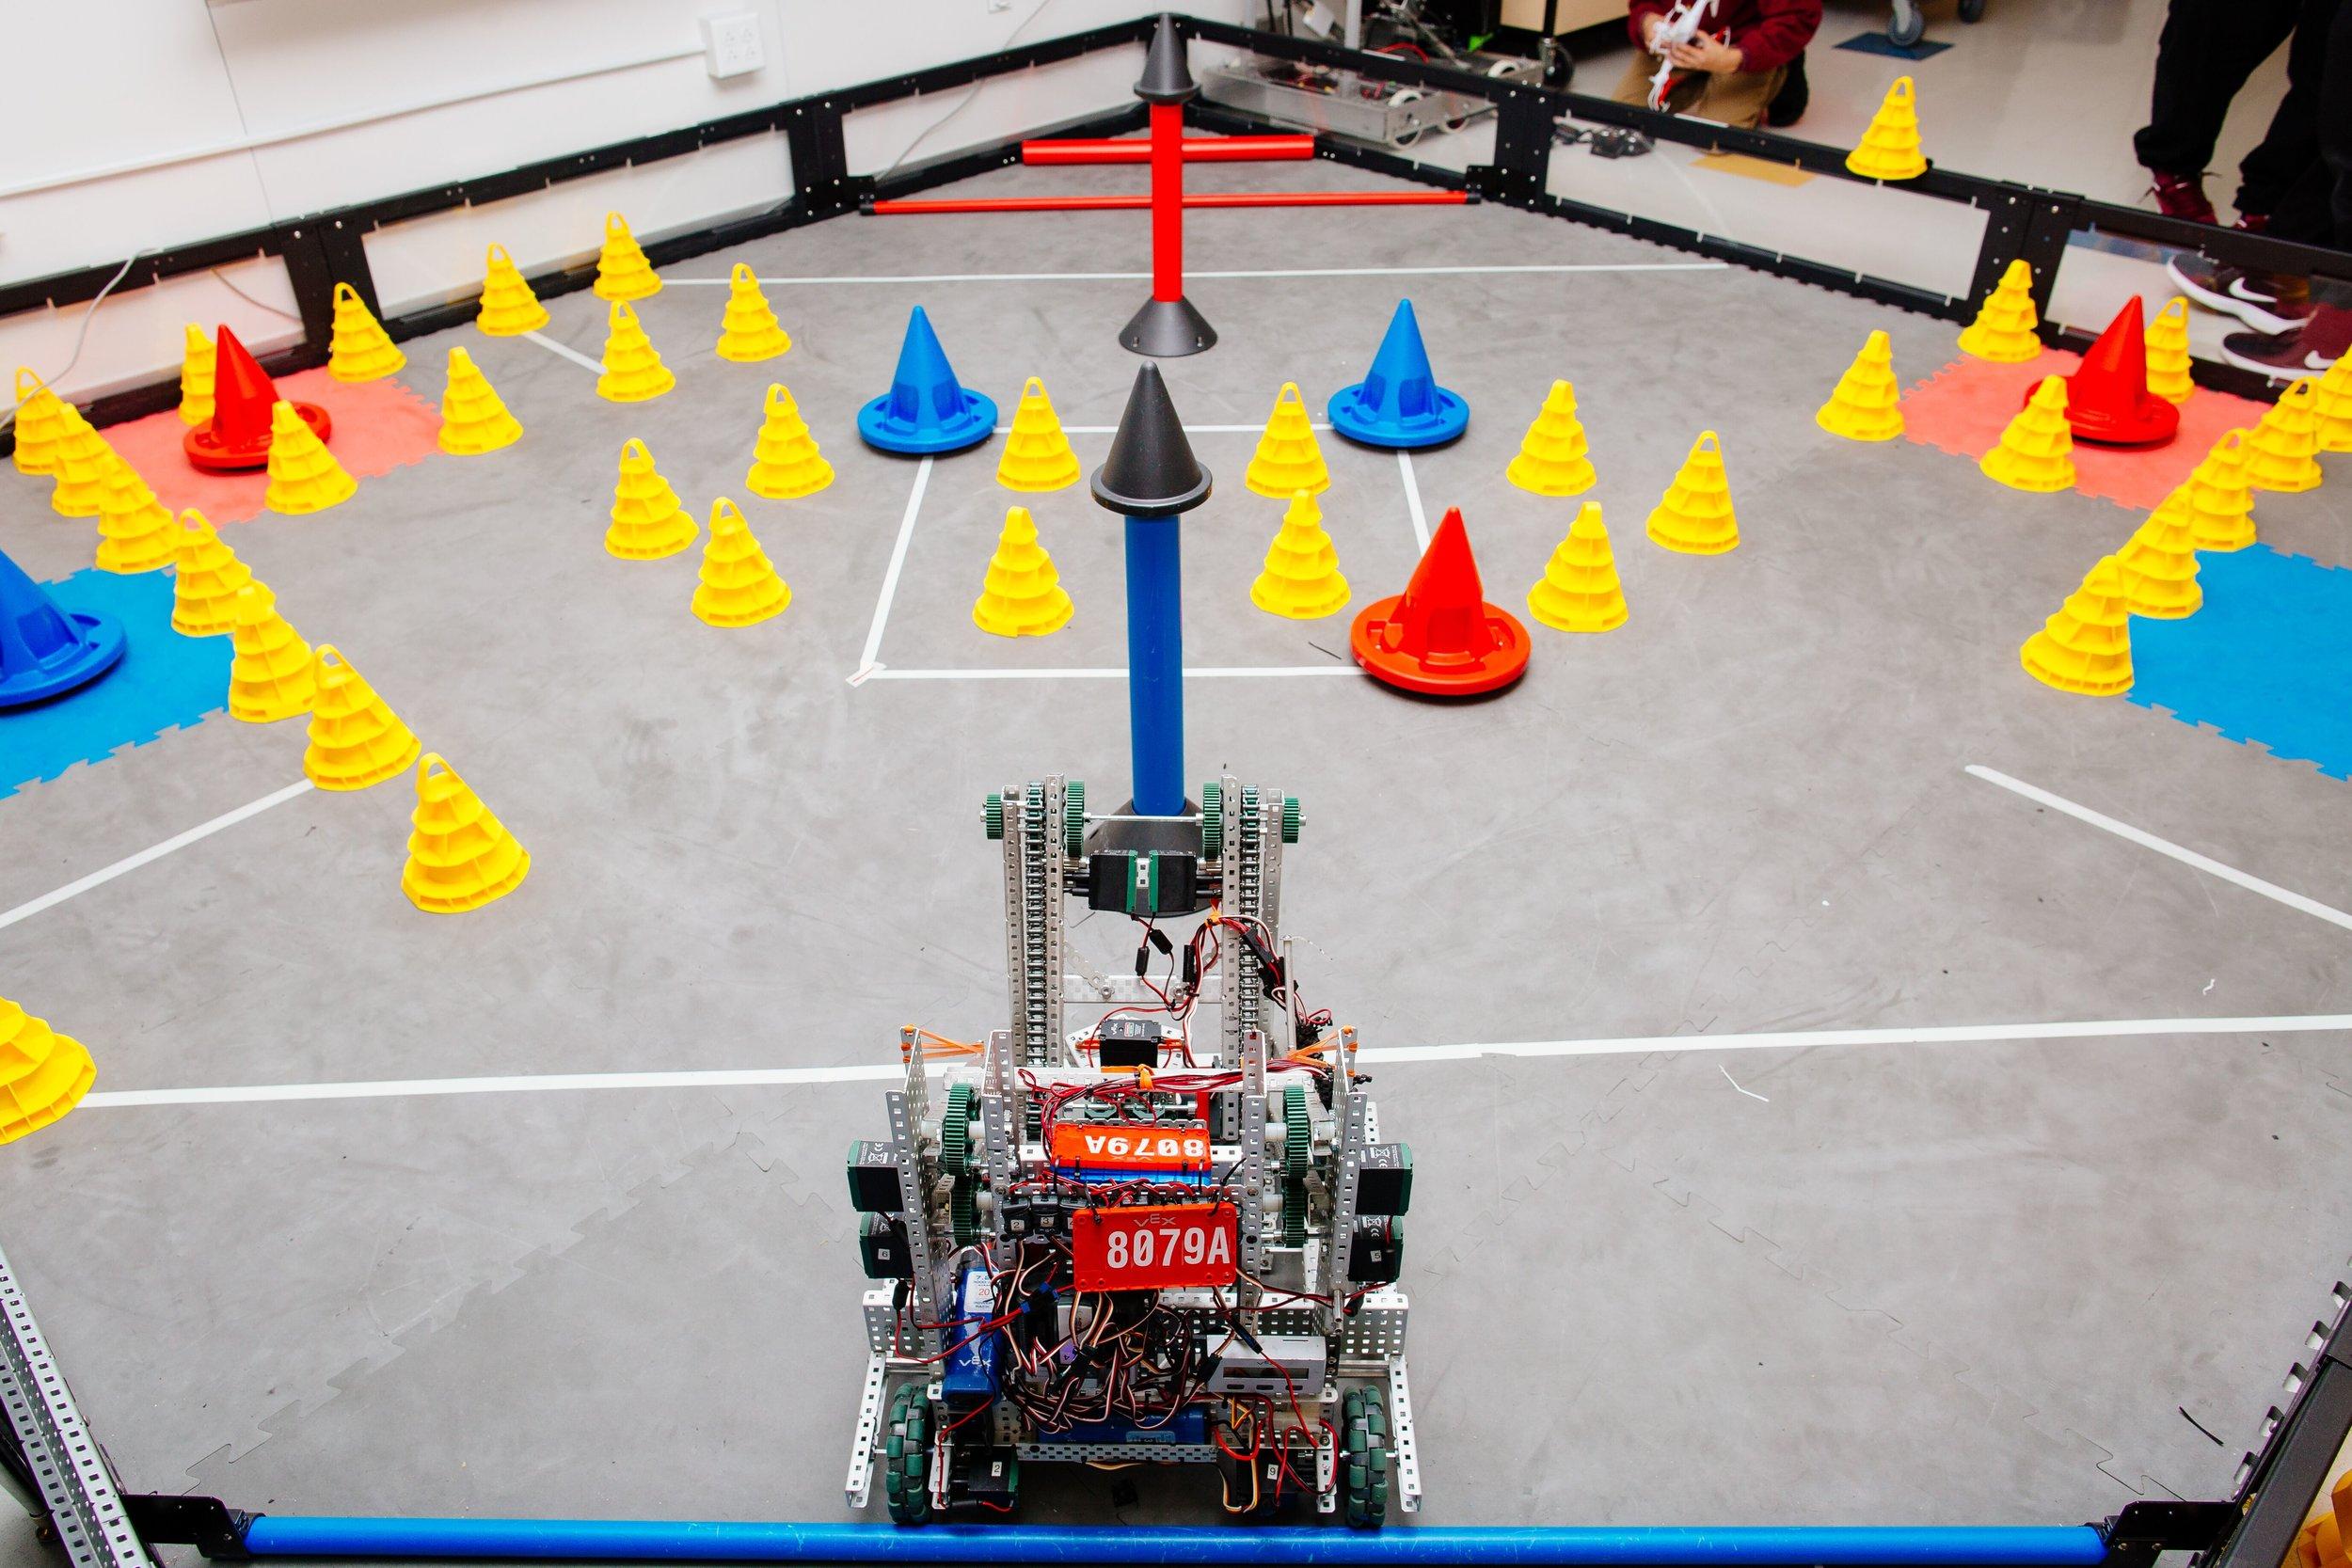 Vex-Robotics Competition